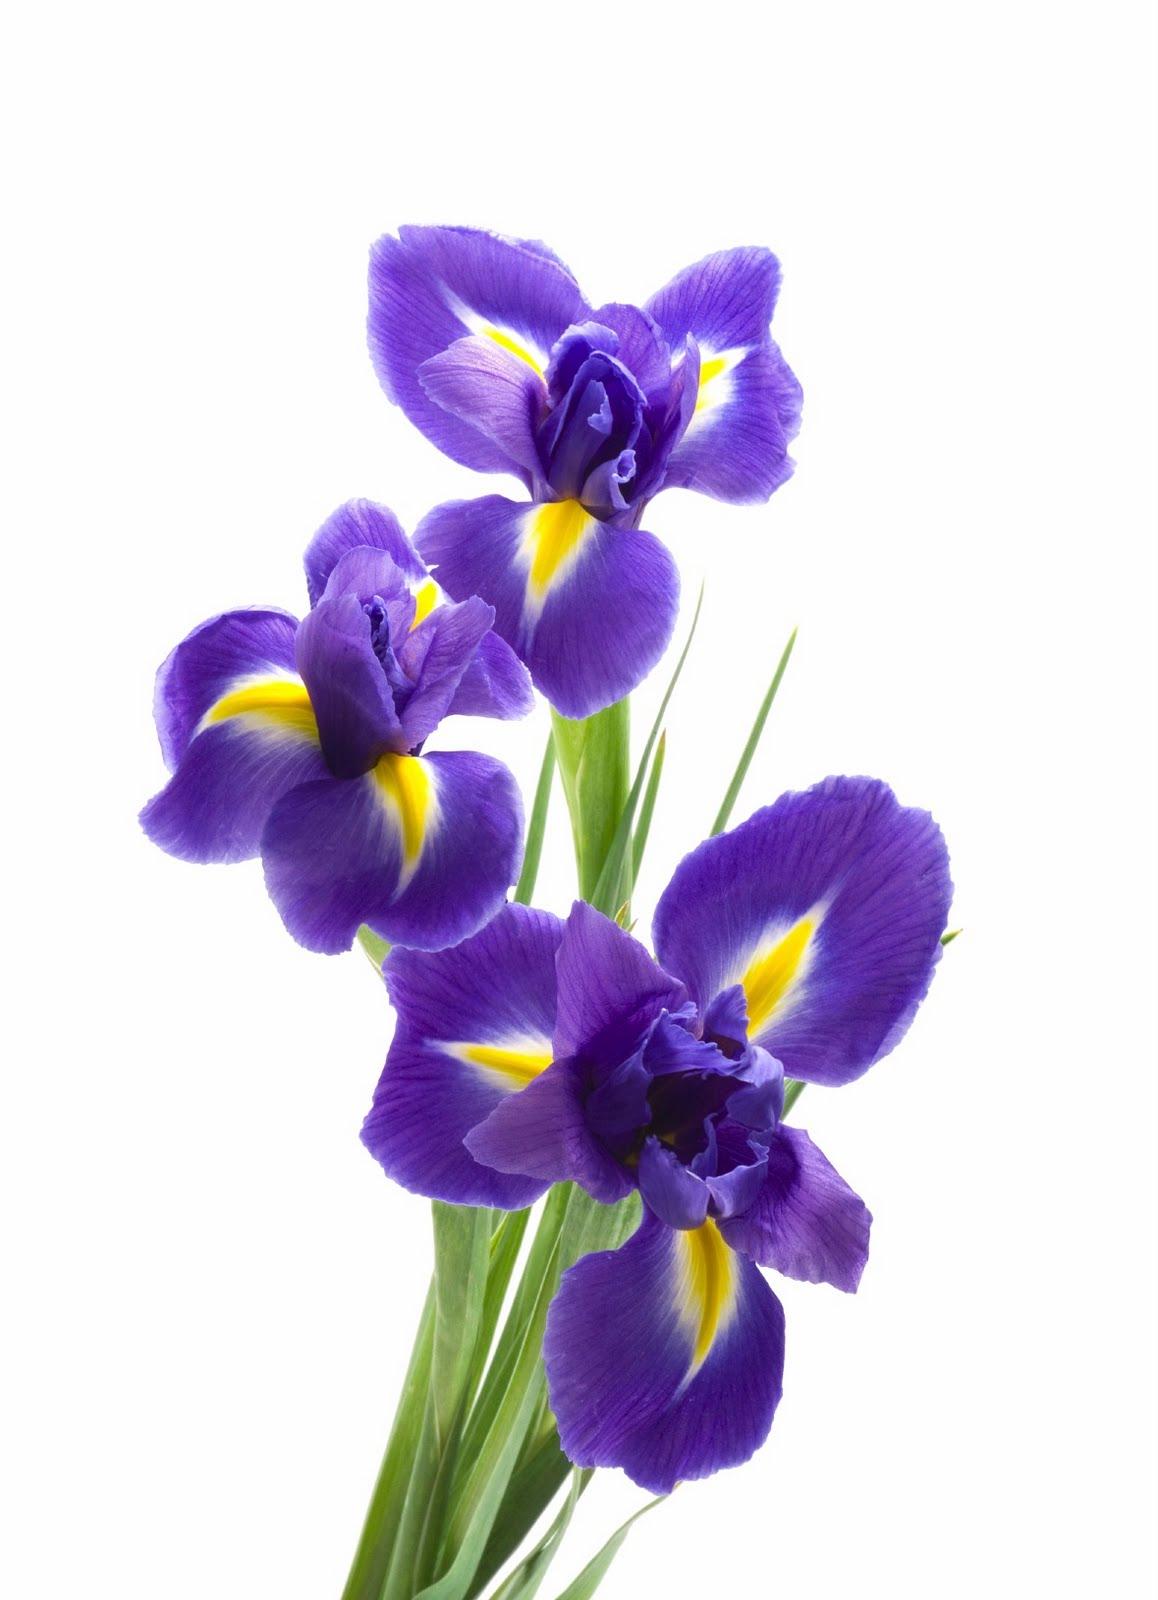 cactus flower florists omgodess 10 stems of iris for 10. Black Bedroom Furniture Sets. Home Design Ideas